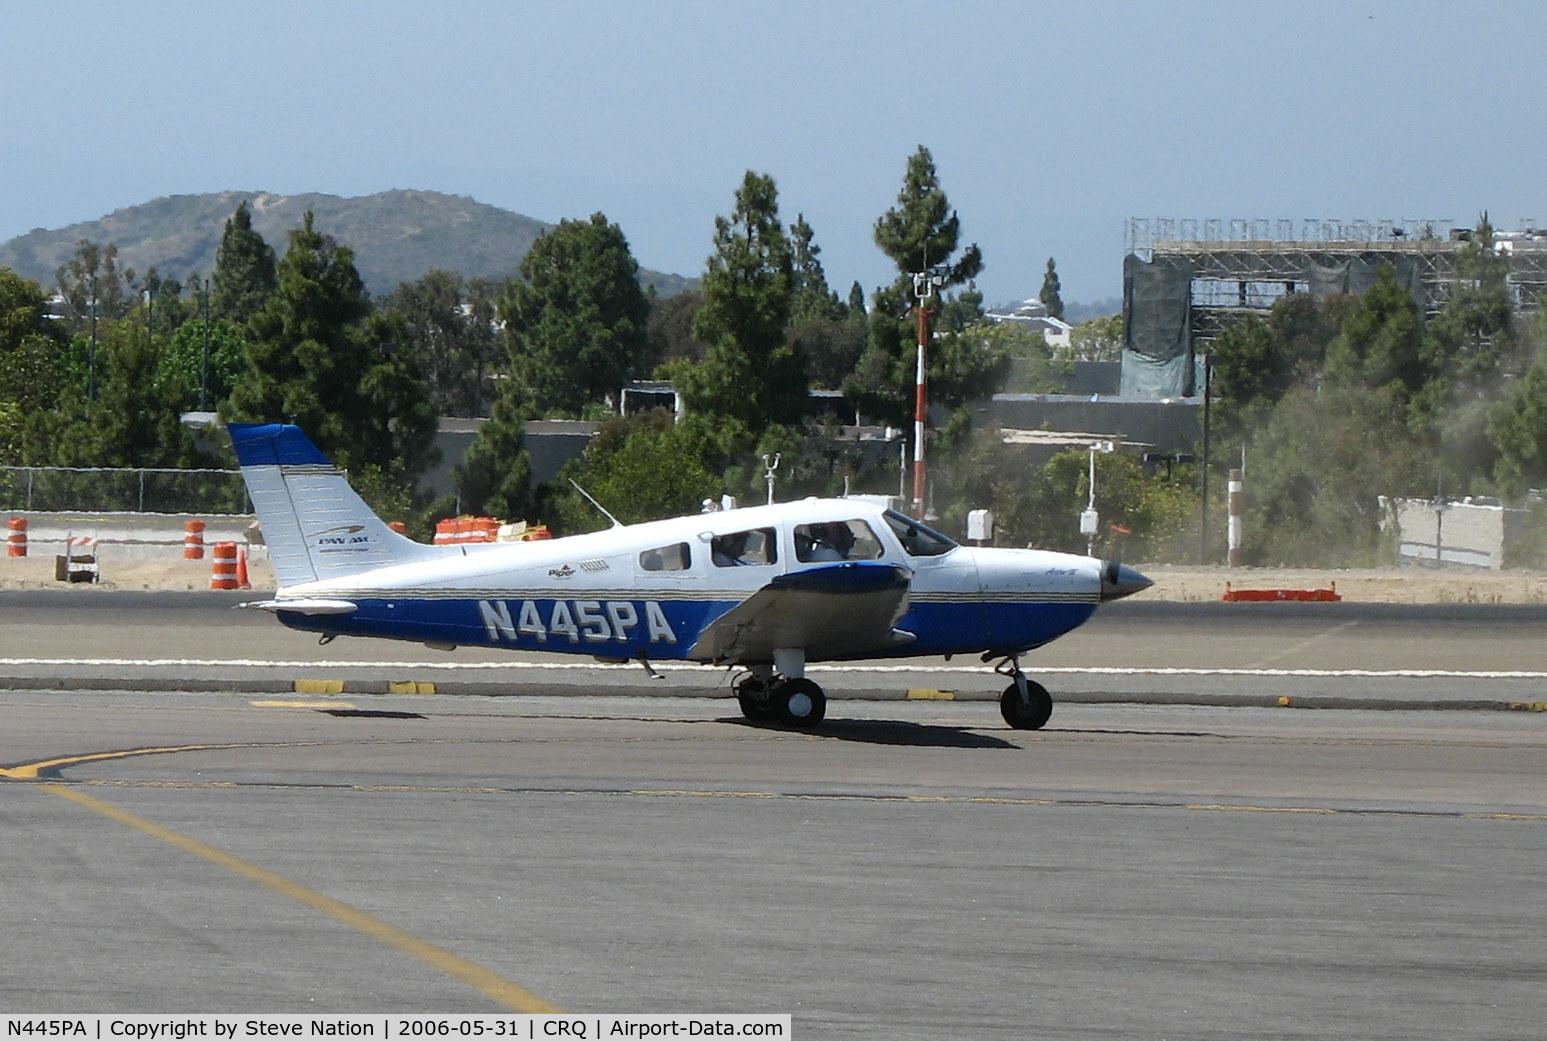 N445PA, 2001 Piper PA-28-181 C/N 2843500, Pan Am Flight Training 2001 Piper PA-28-181 (w/titles) taxying @ McClellan-Palomar Airport, CA